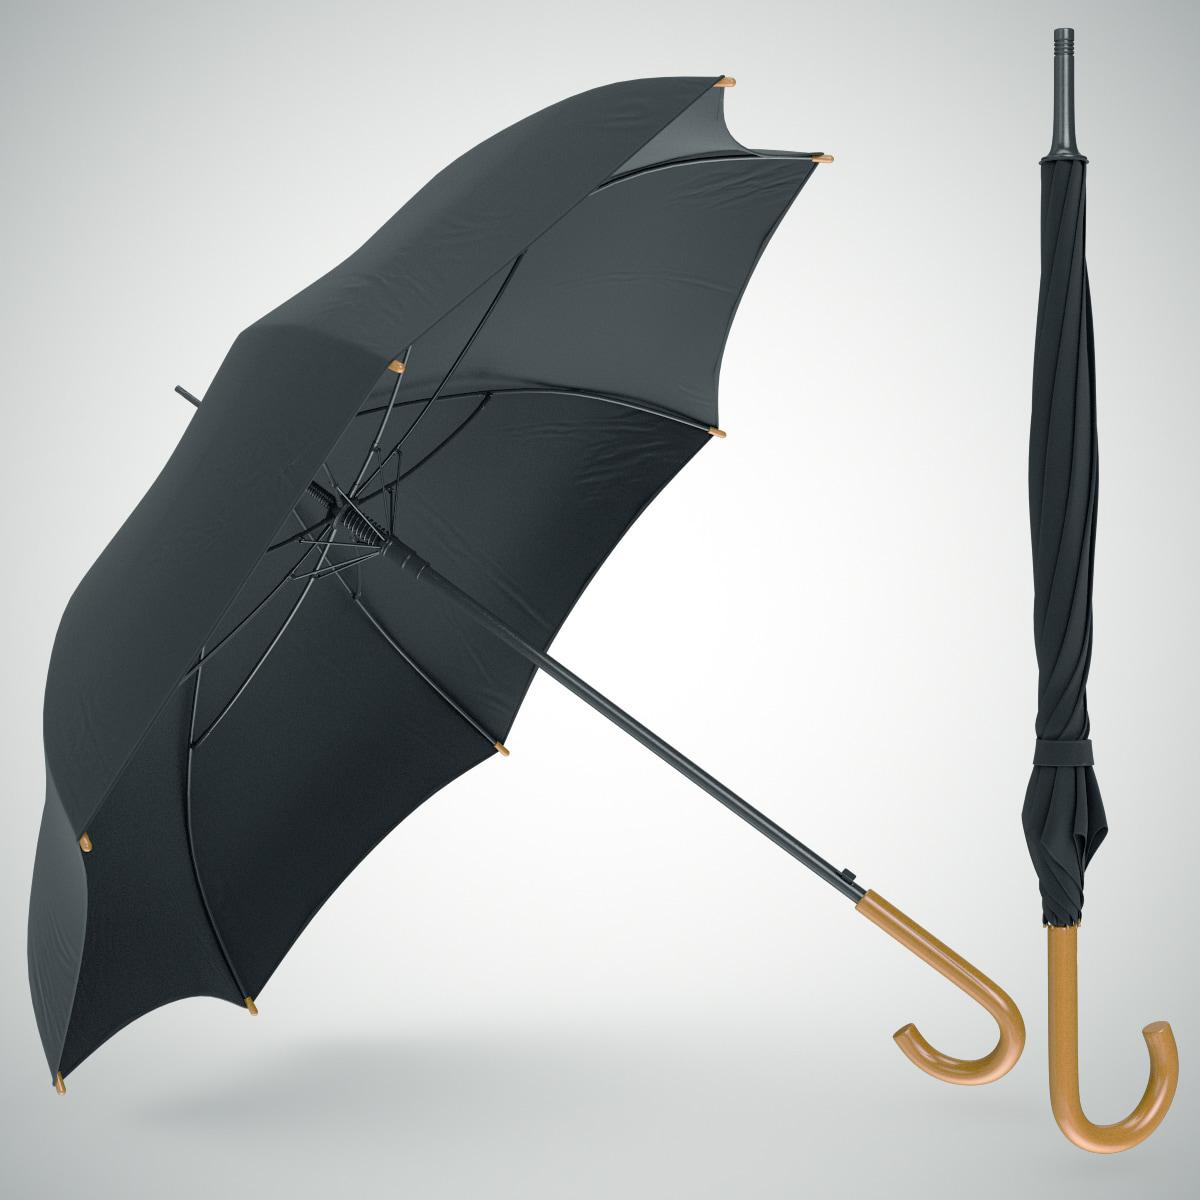 Umbrella_Classic_Bac_dark_00142.jpg